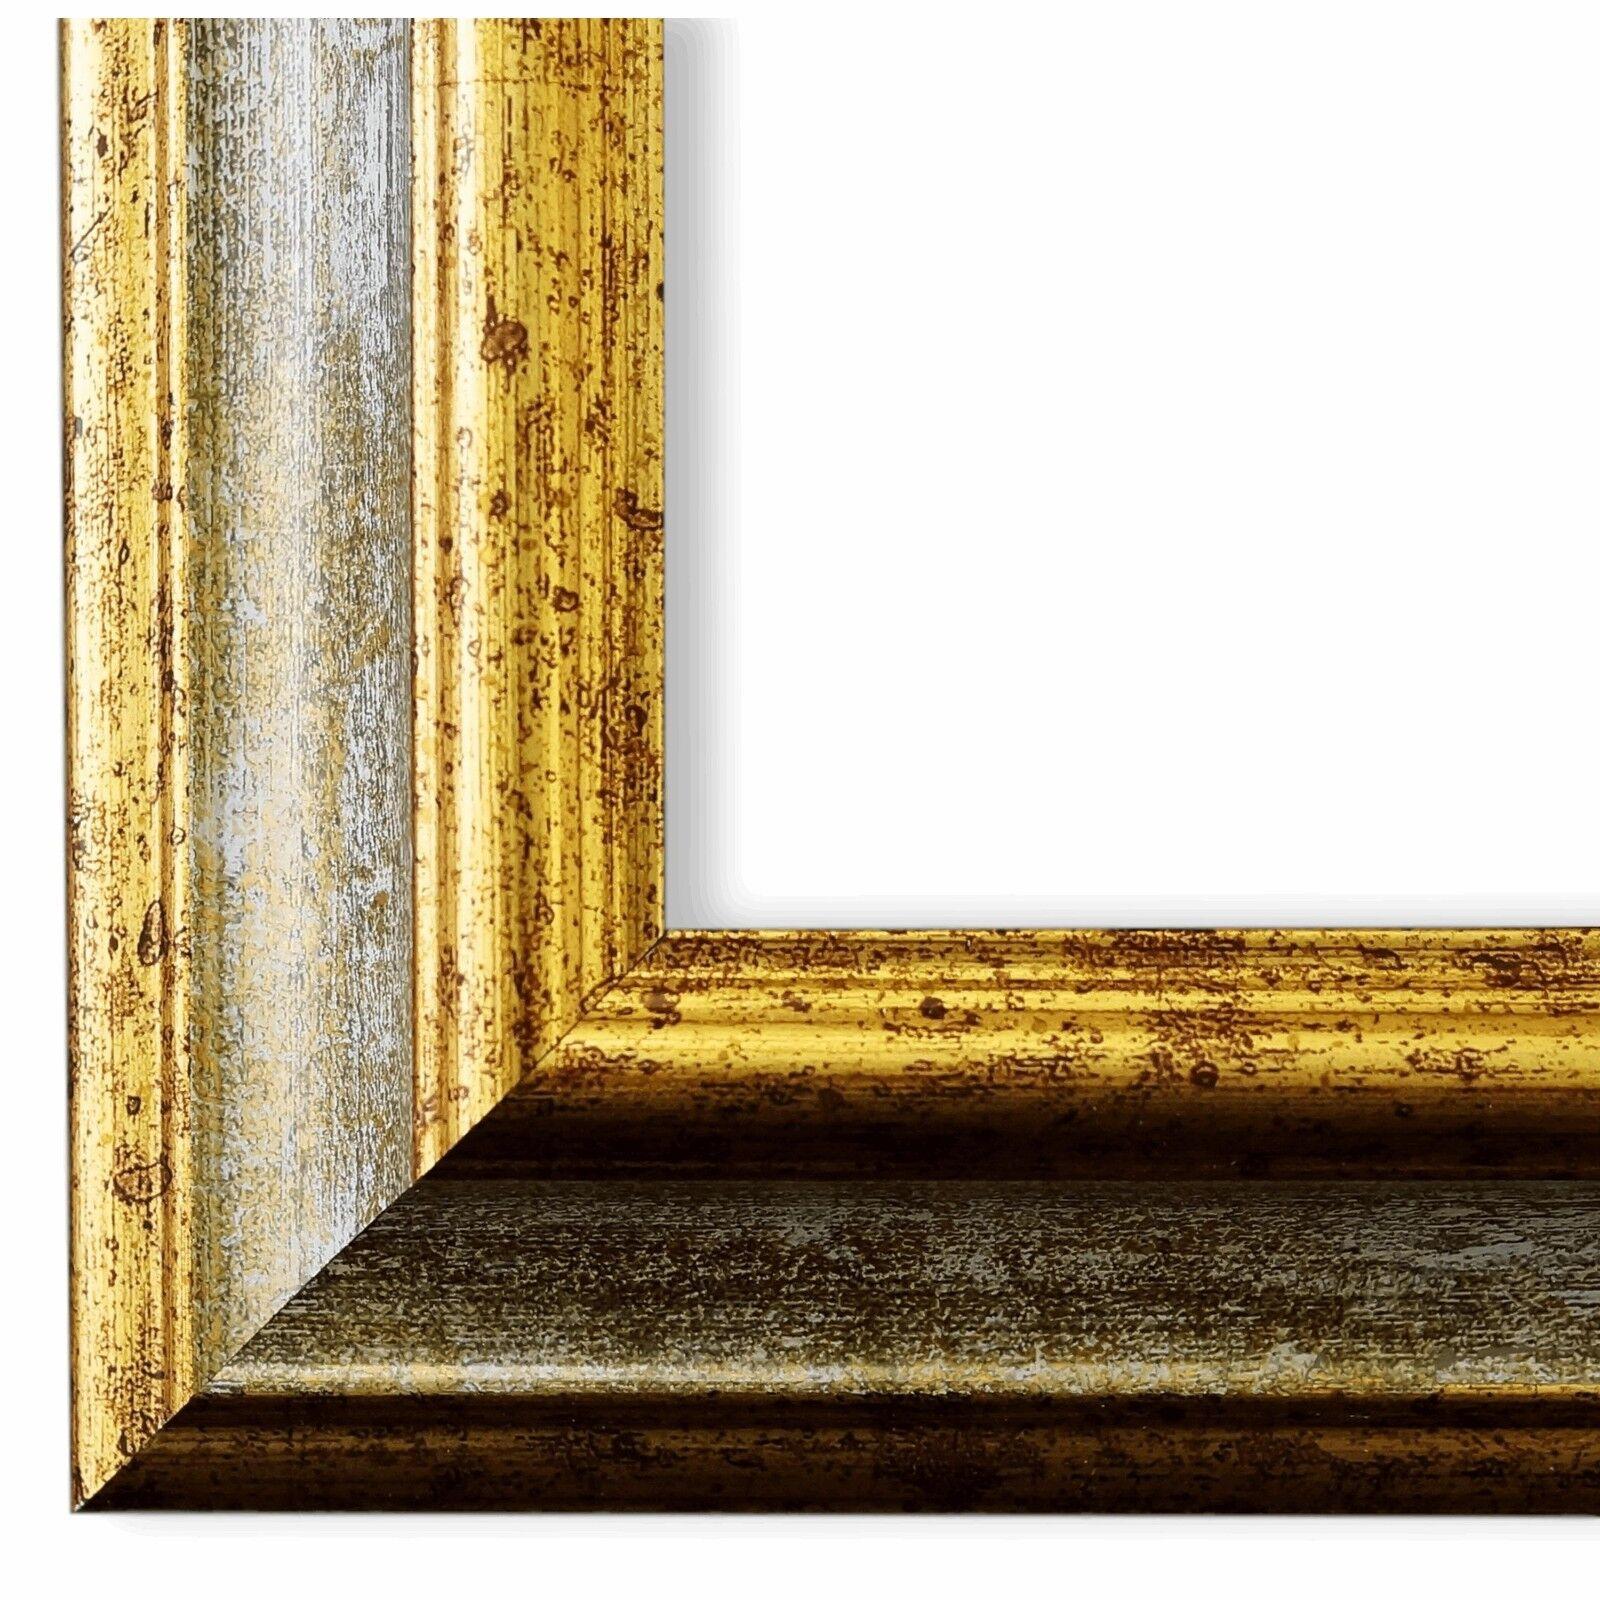 Bilderrahmen Grau Gold Antik Vintage Retro Bari 4,4 - NEU alle Größen